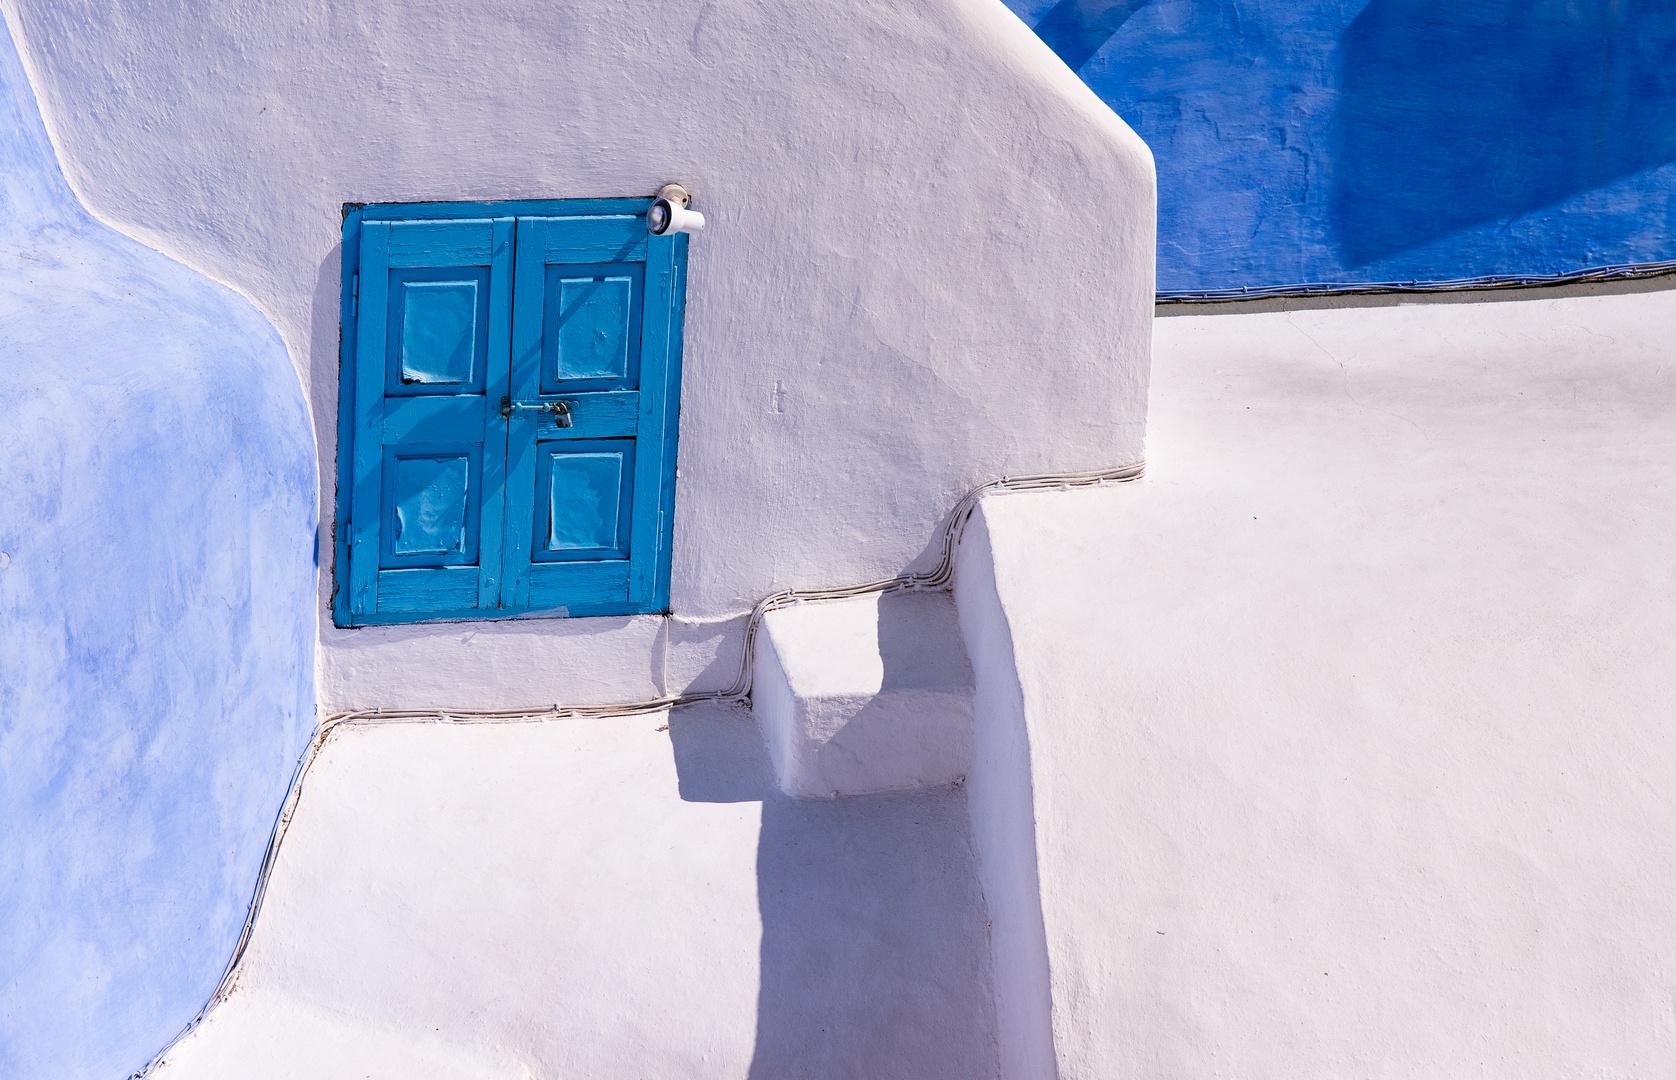 Santorini in Blau - Weiß